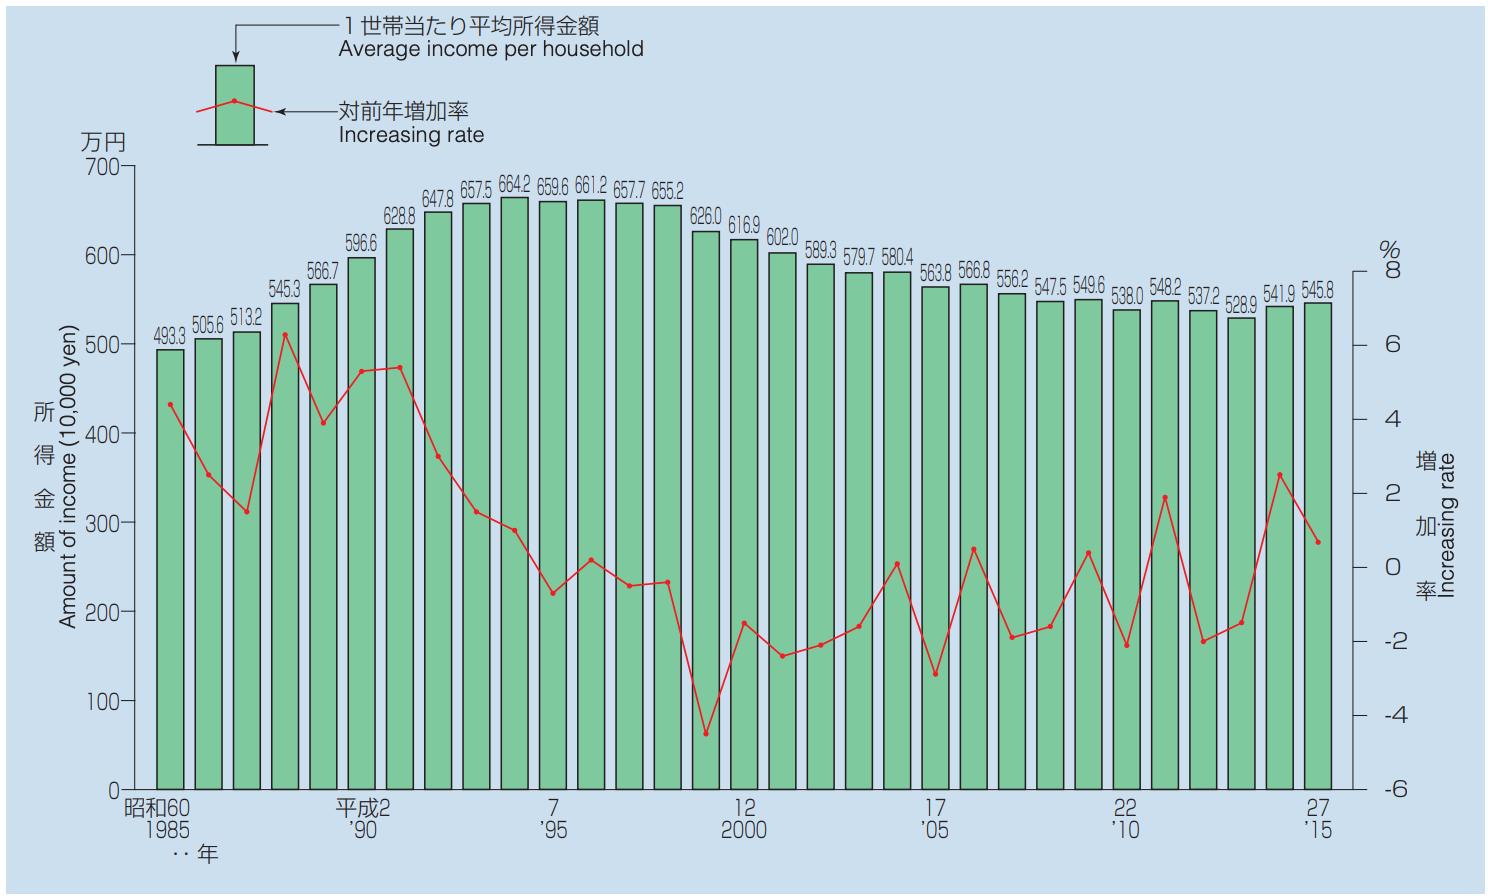 1世帯当たり平均所得金額・対前年増加率の年次推移